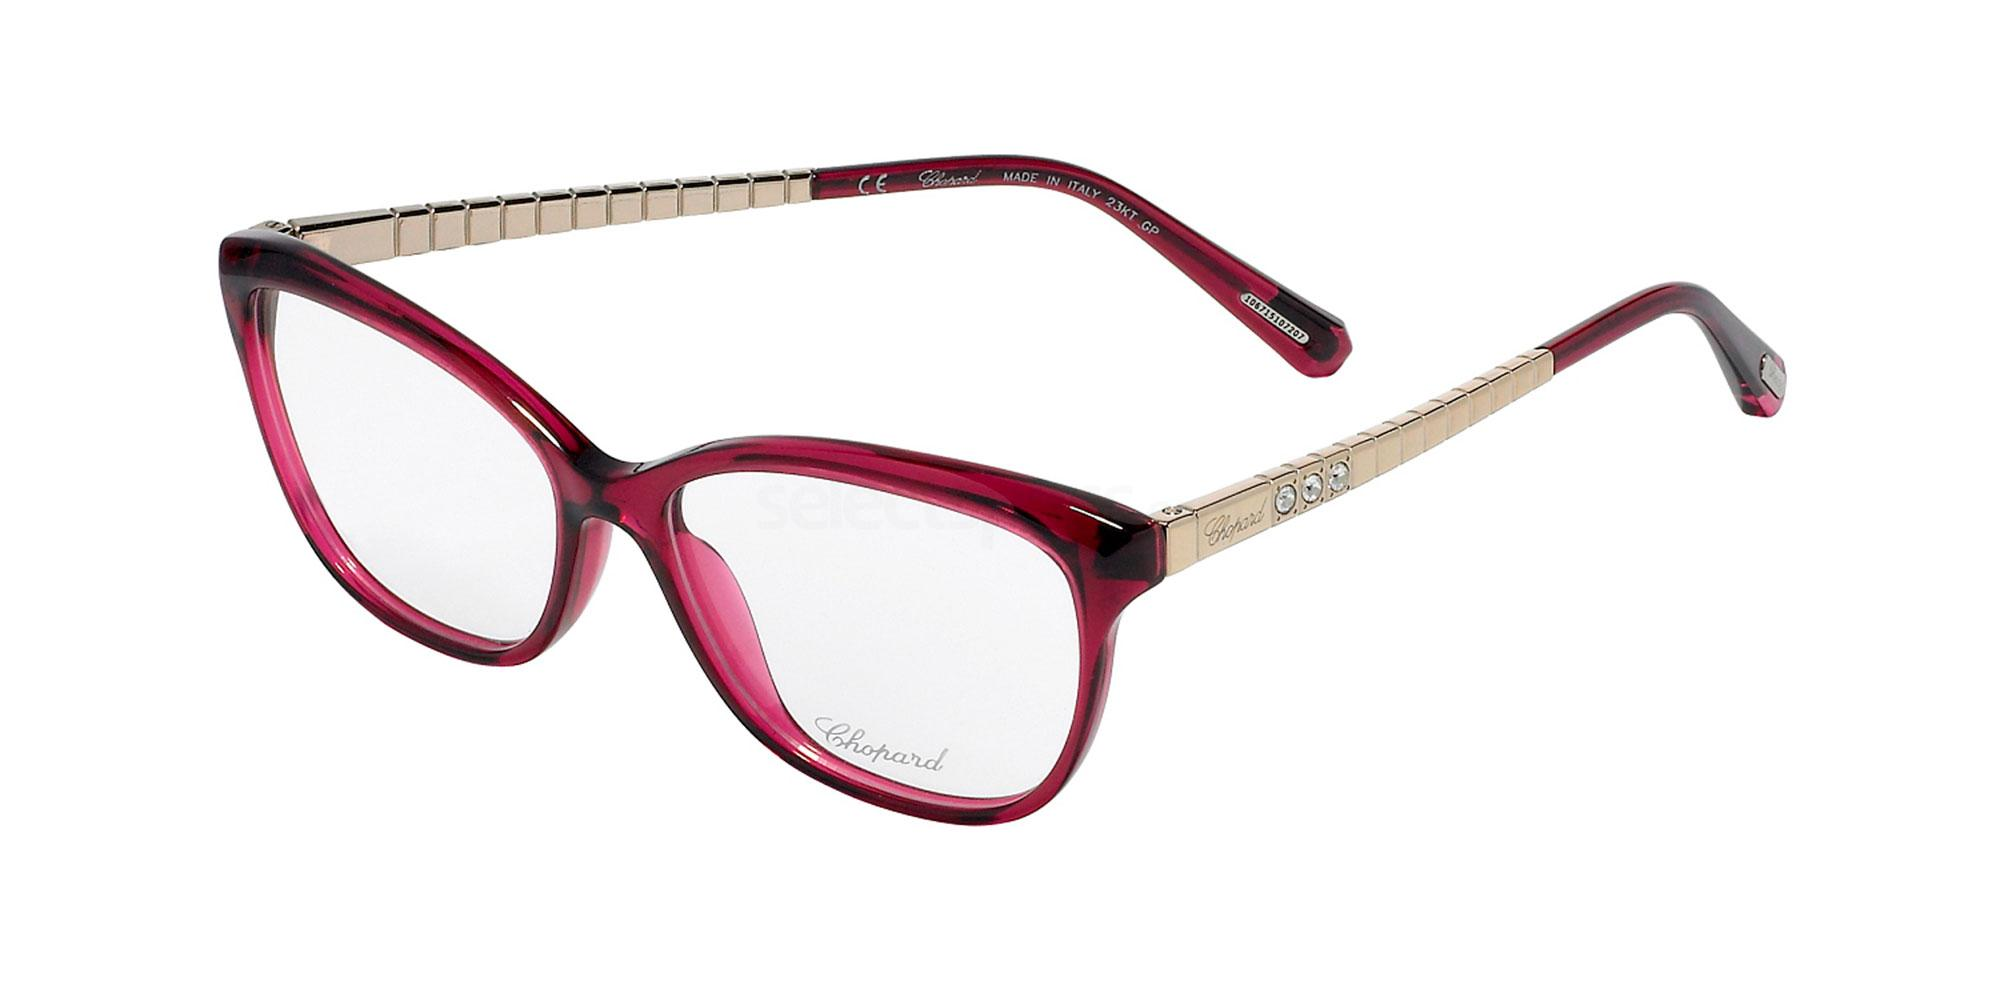 01BV VCH243S Glasses, Chopard